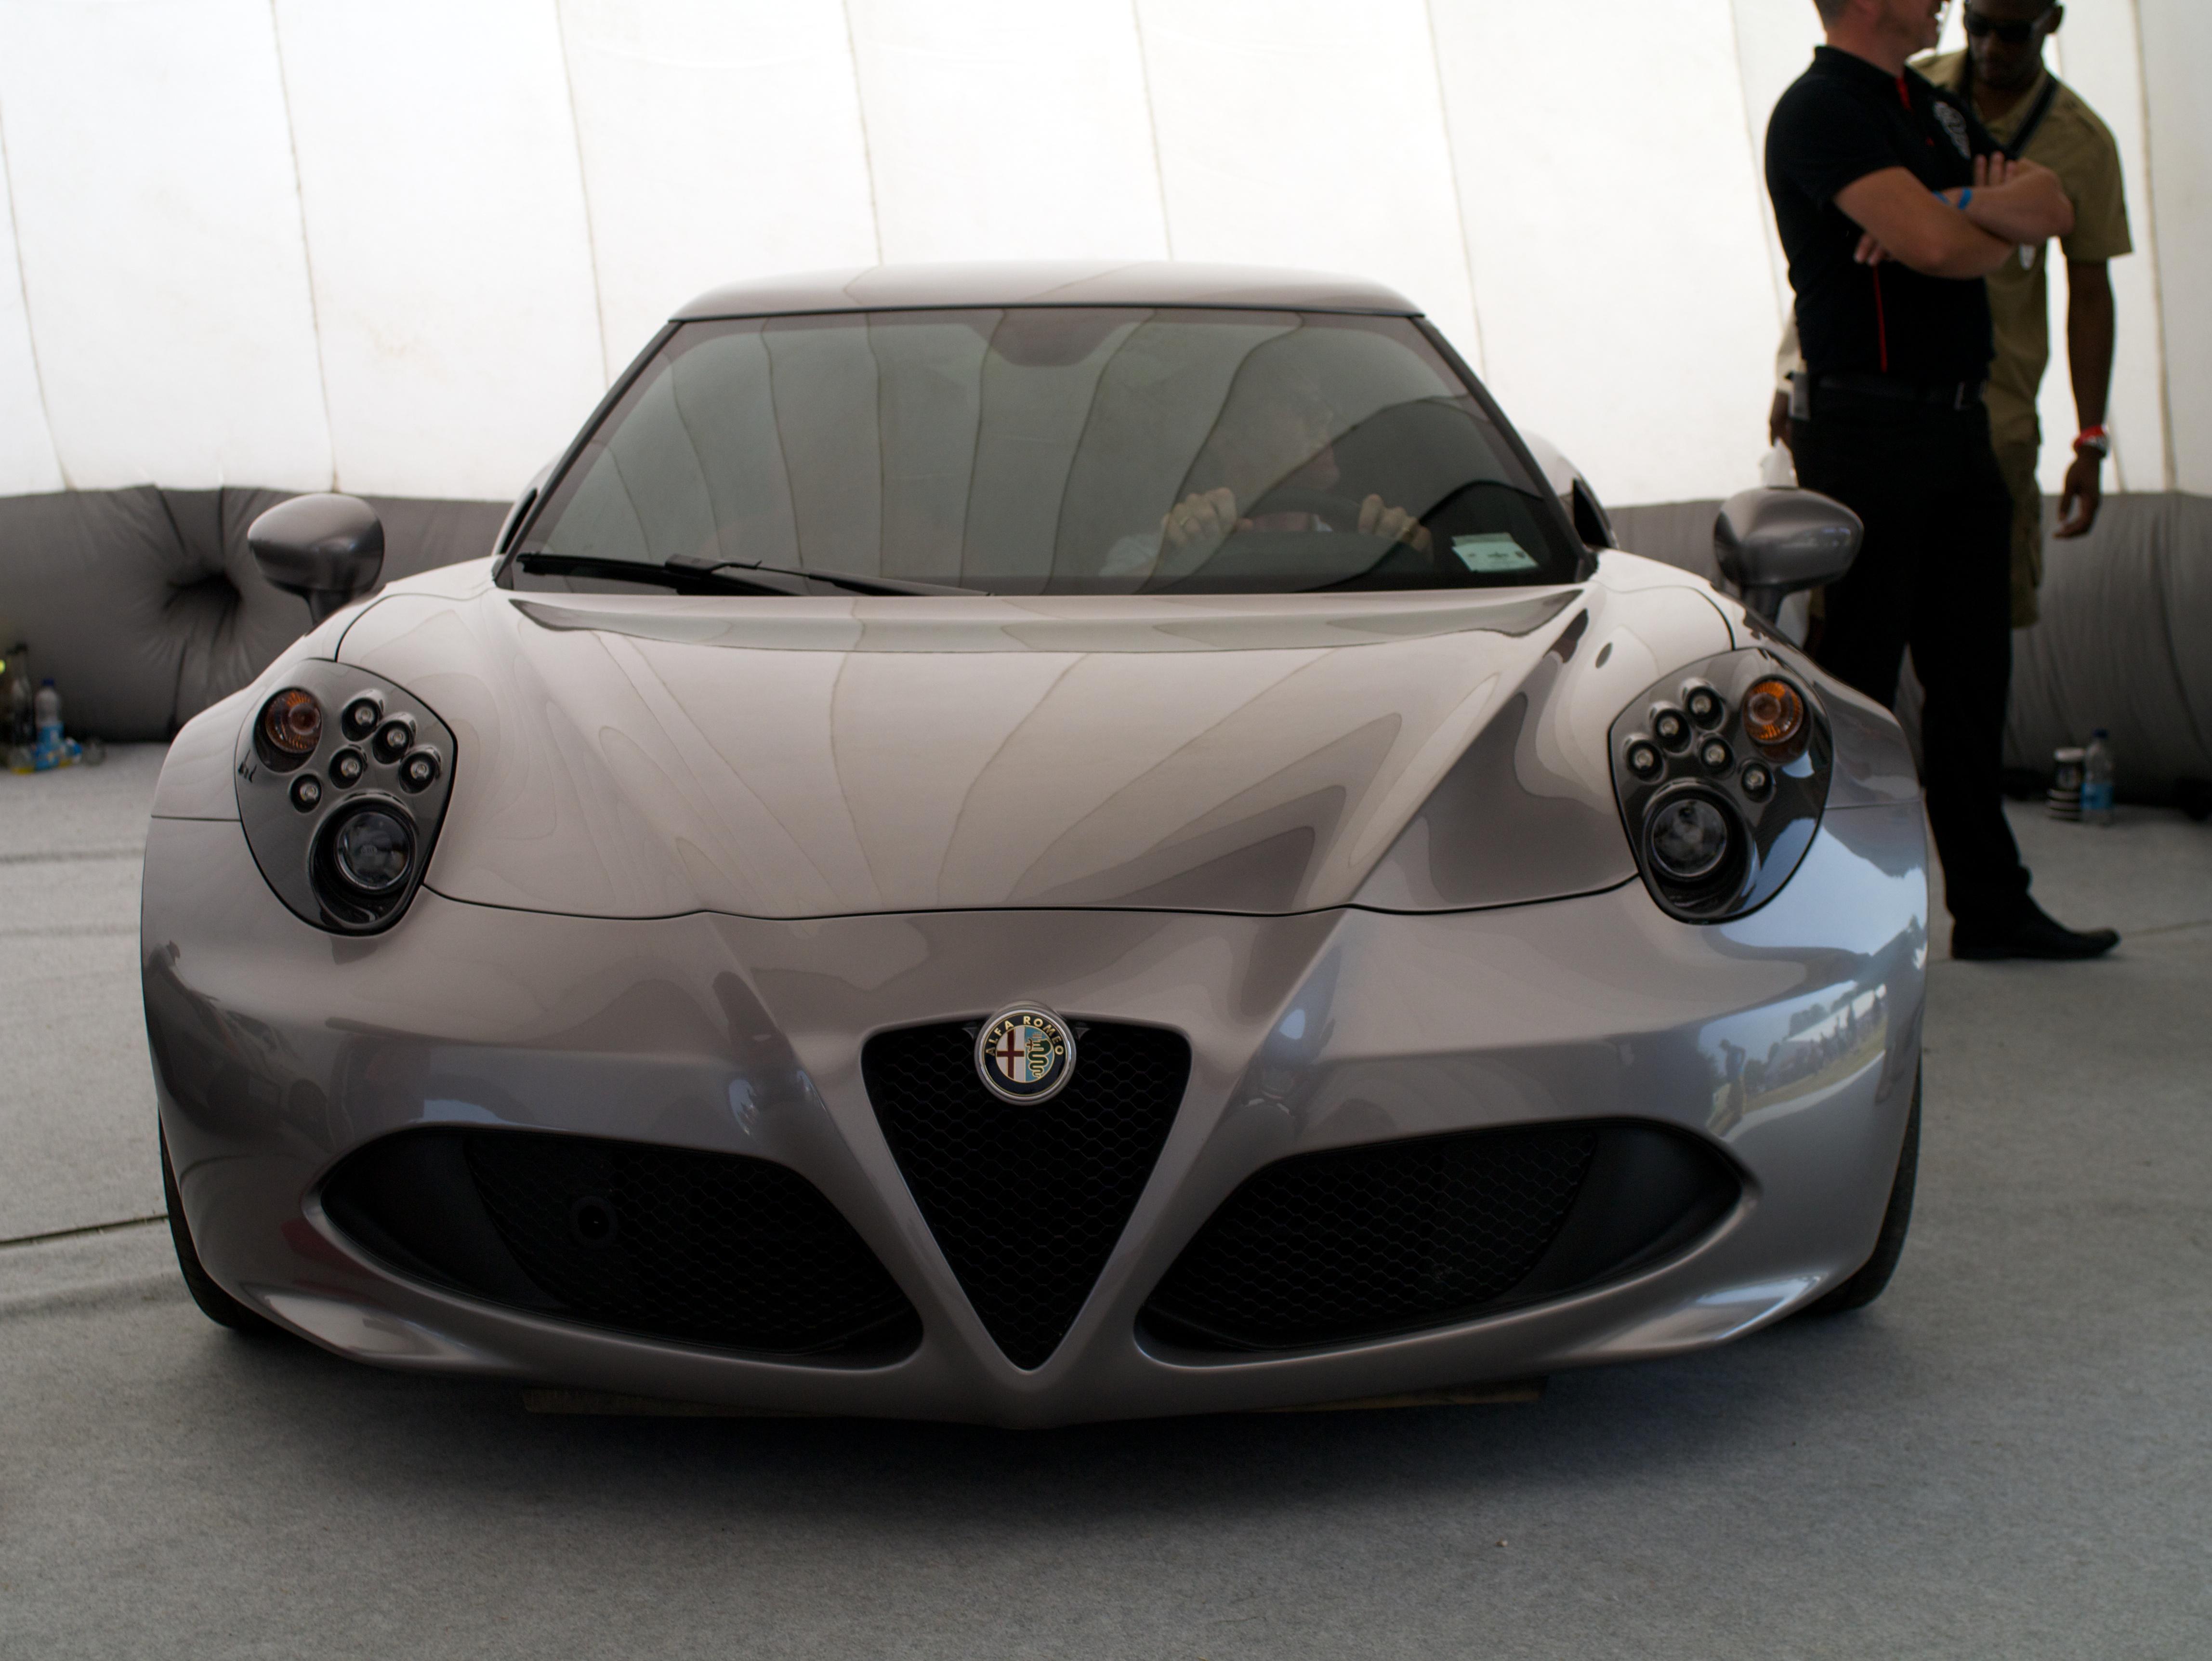 Alfa romeo cars wiki 5